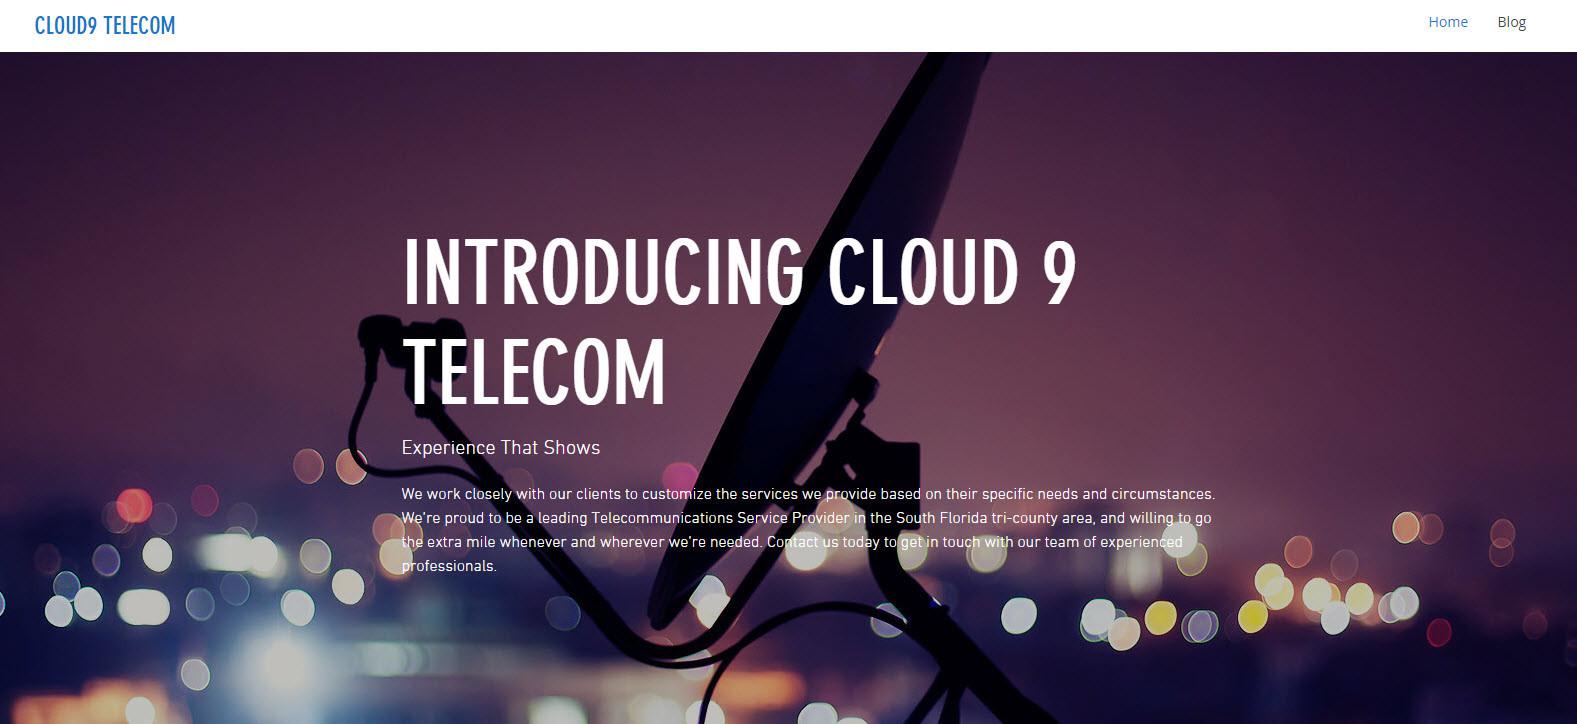 cloud9-telecom.jpg